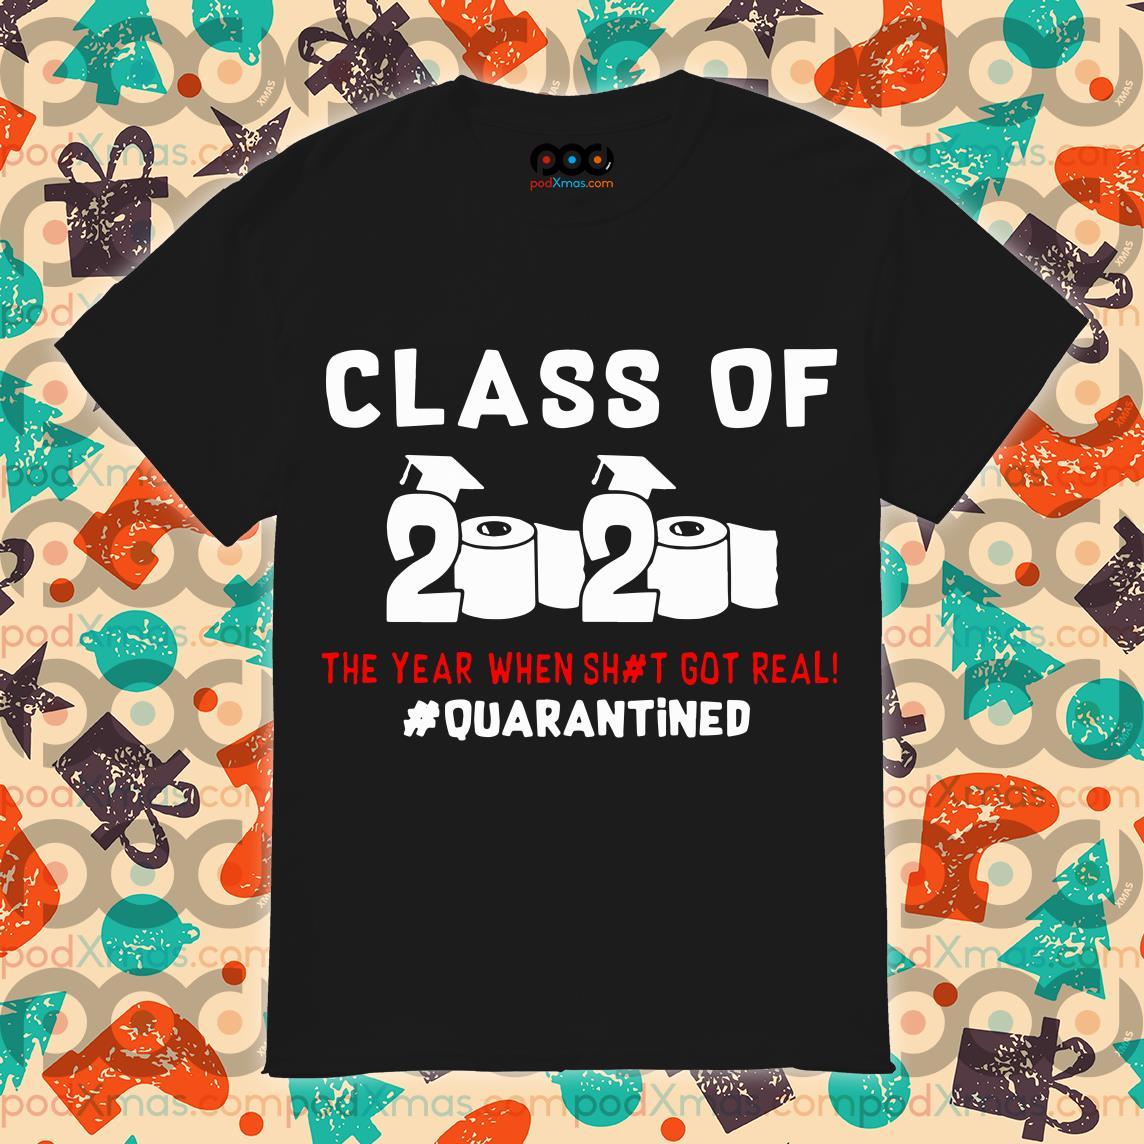 Class of 2020 #quarantined T-shirt